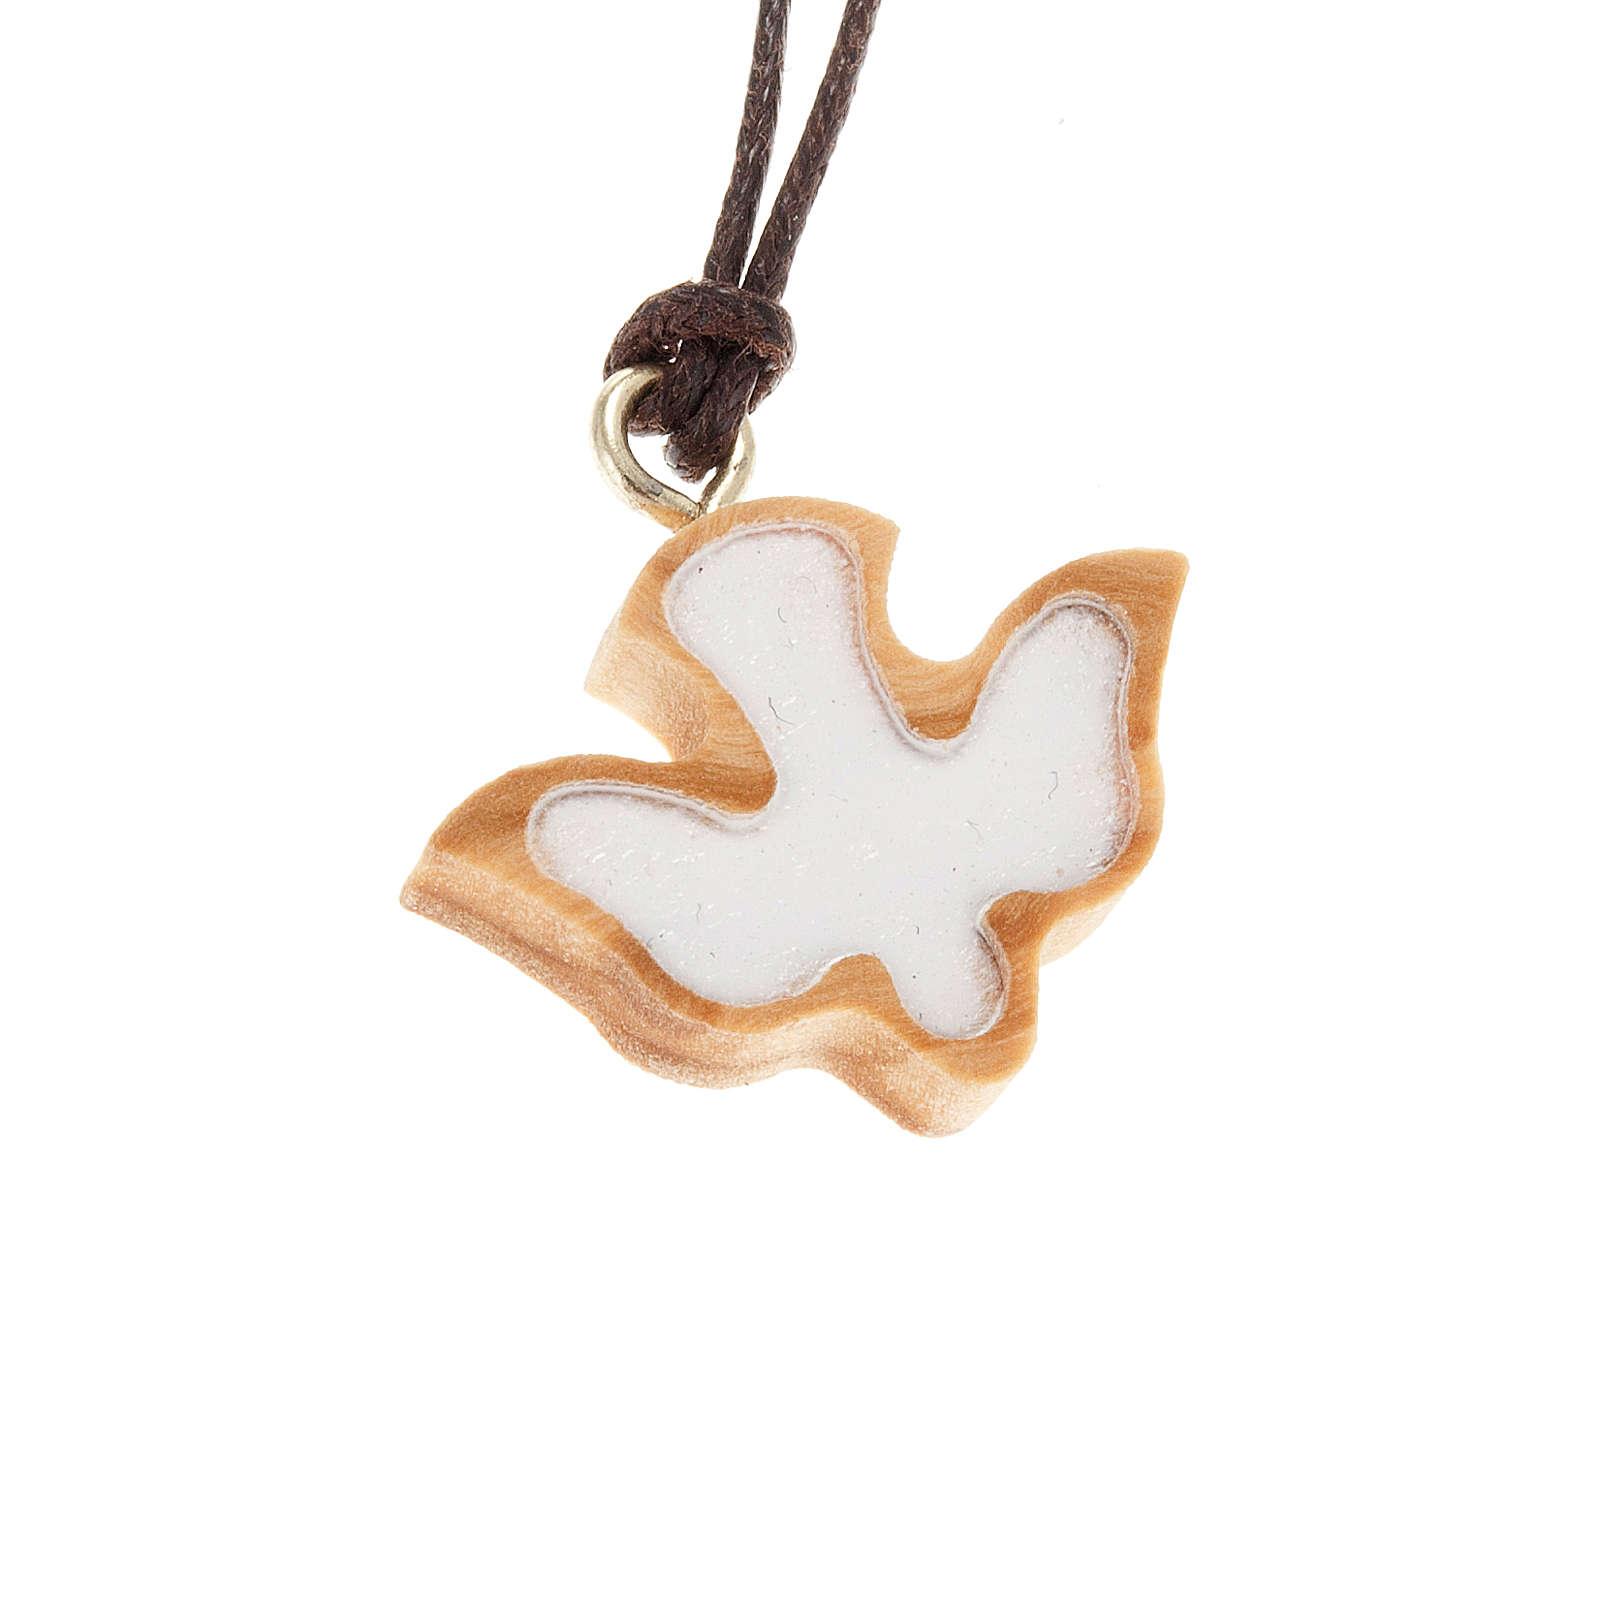 Médaille bois d'olivier colombe blanche 4